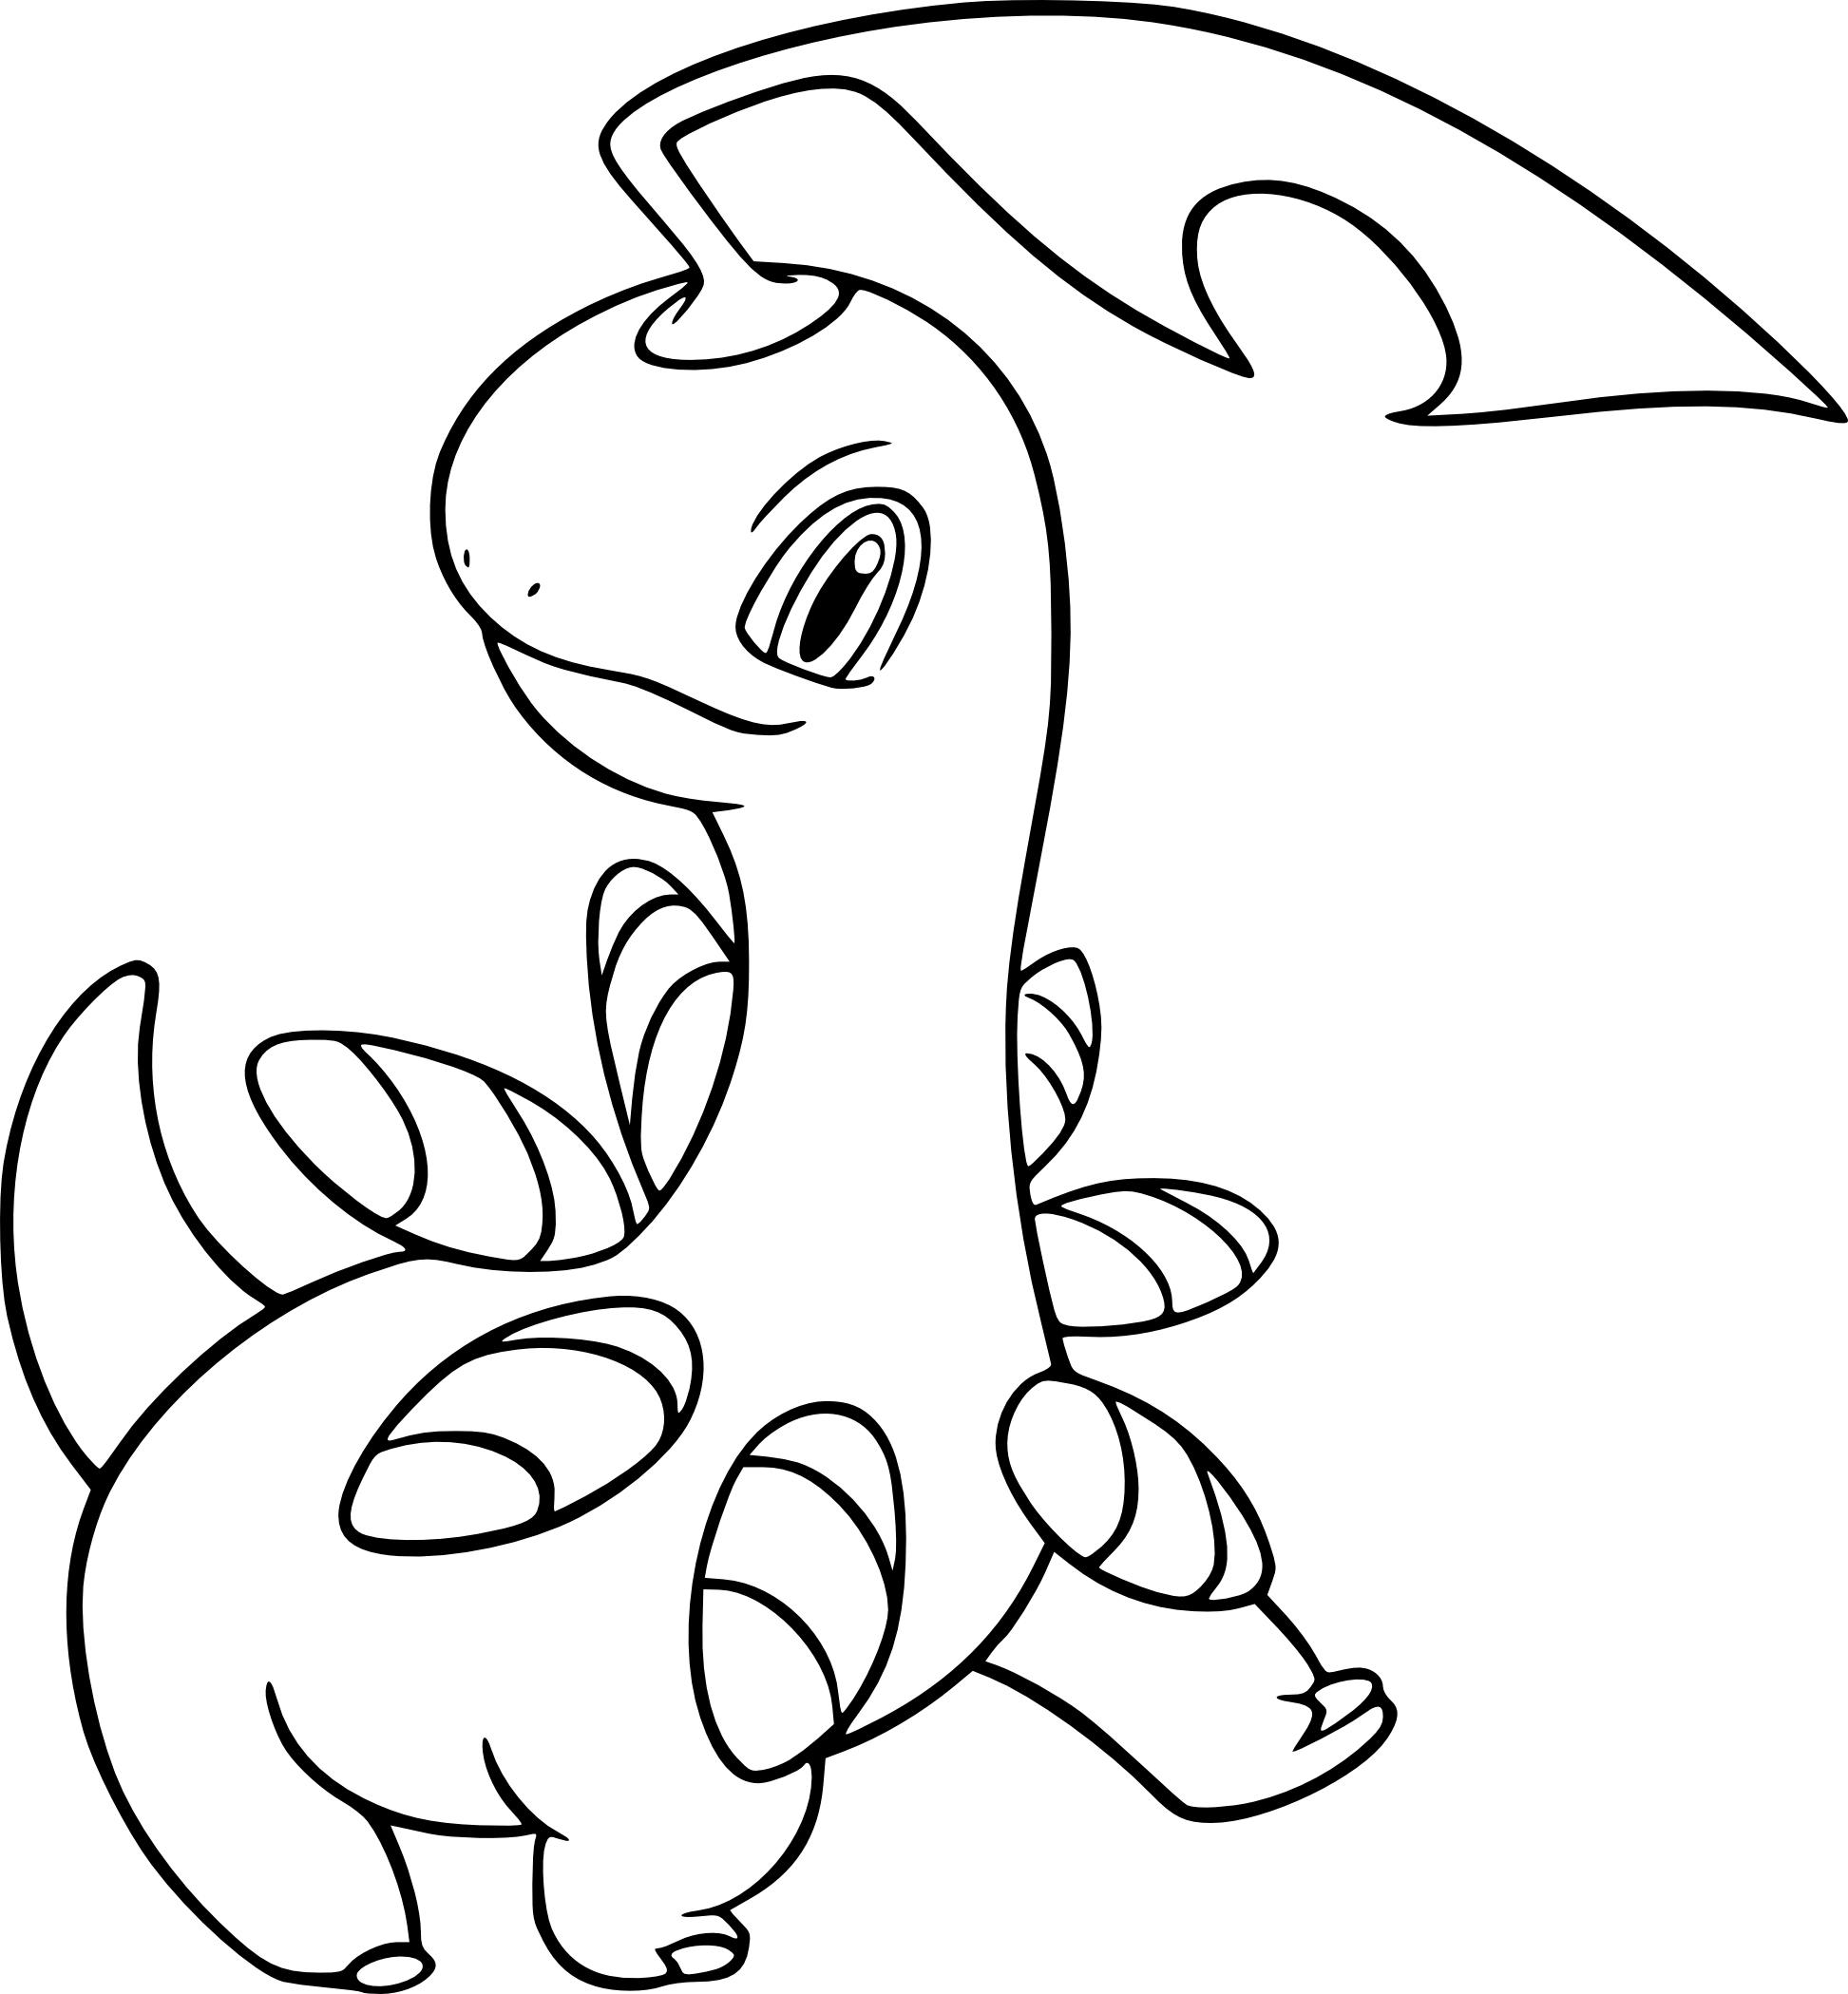 Coloriage Macronium Pokemon 224 Imprimer